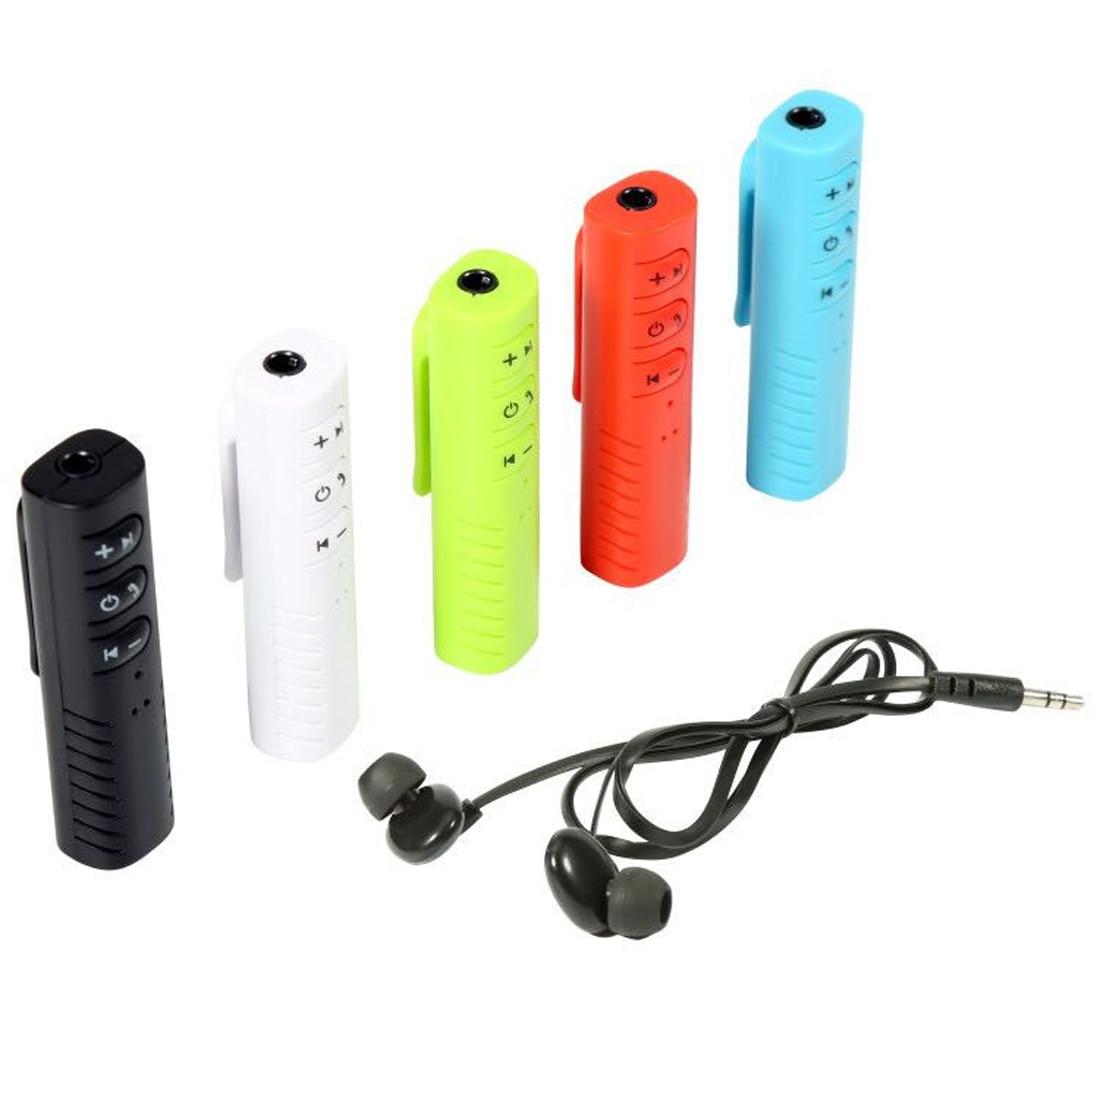 Aliexpress Com Buy Car Bluetooth Aux 3 5mm Jack Bluetooth Receiver Handsfree Call Bluetooth: New Car Bluetooth AUX 3.5mm Jack Bluetooth Receiver Handsfree Call Bluetooth Adapter Car